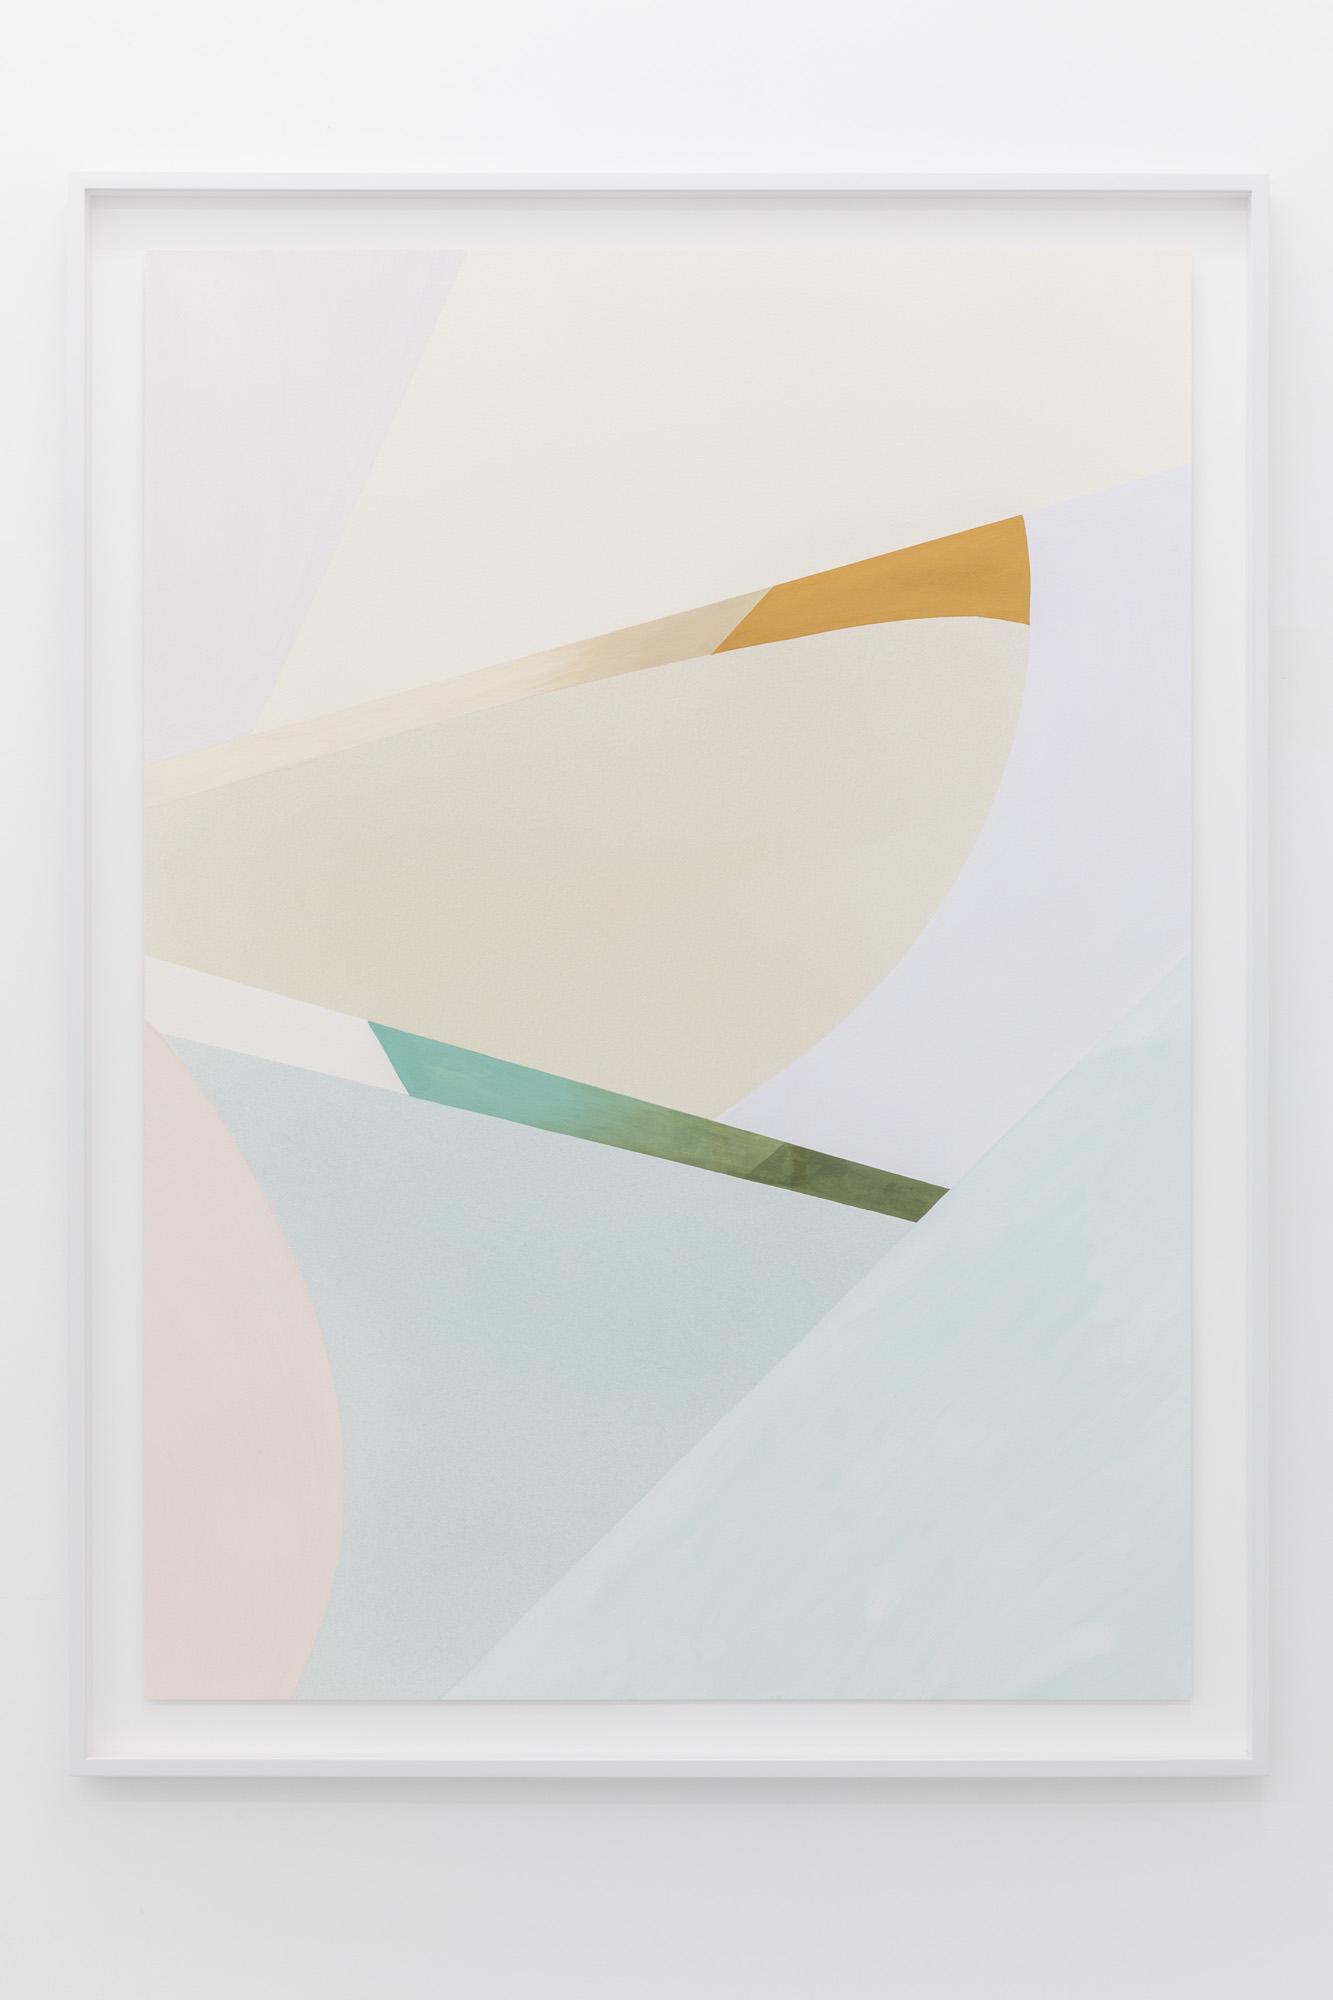 Lightcurves V, 2020, Watercolor and casein tempera on 640 gsm Arches Grain Torchon paper, 130,5 x 94,3 cm, Unique